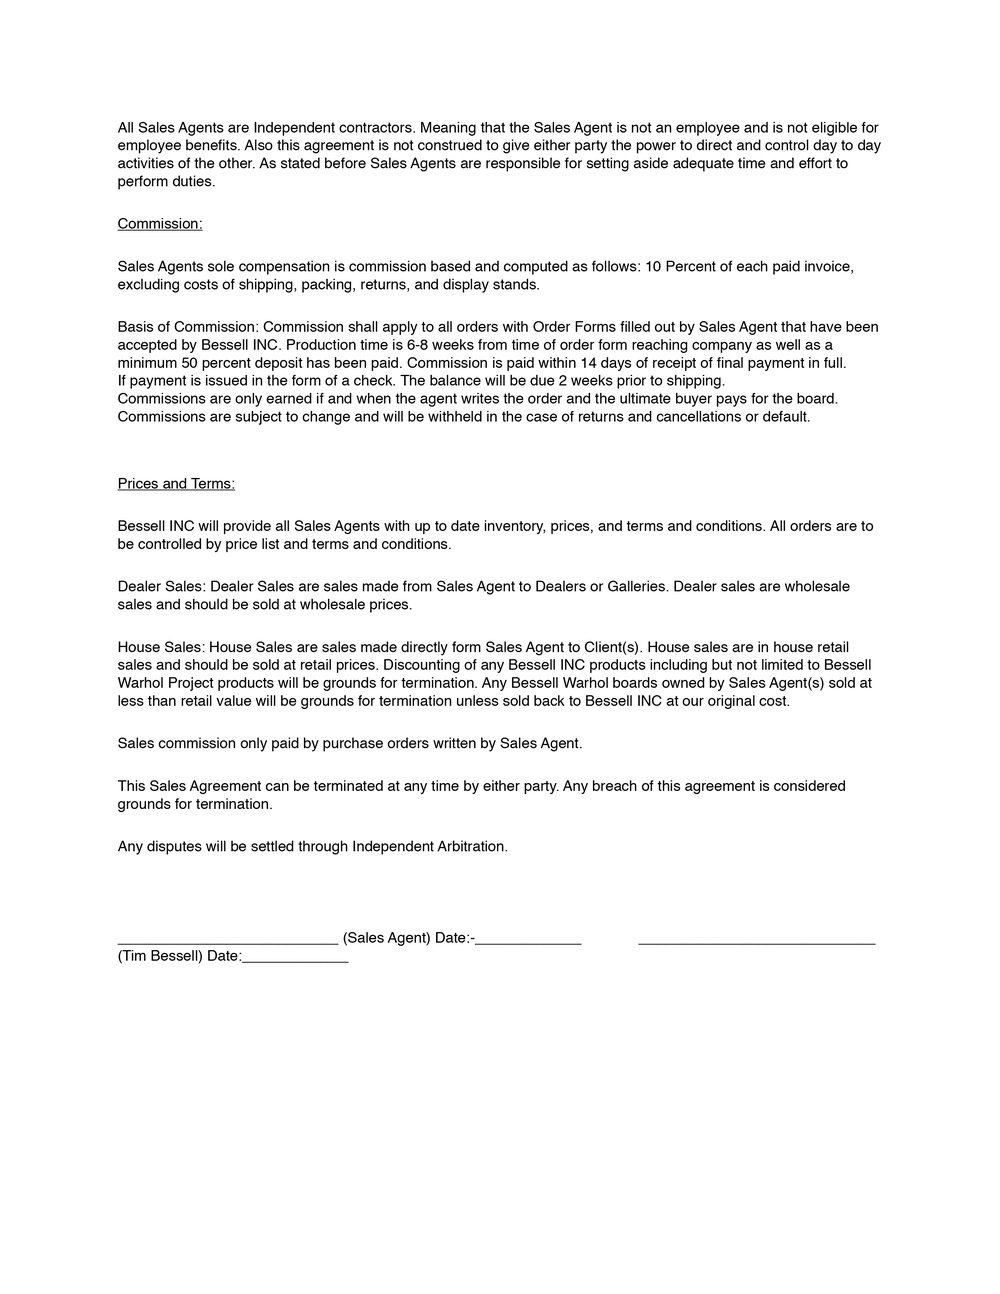 BessellWarholSalesAgreement 2016-2.jpg